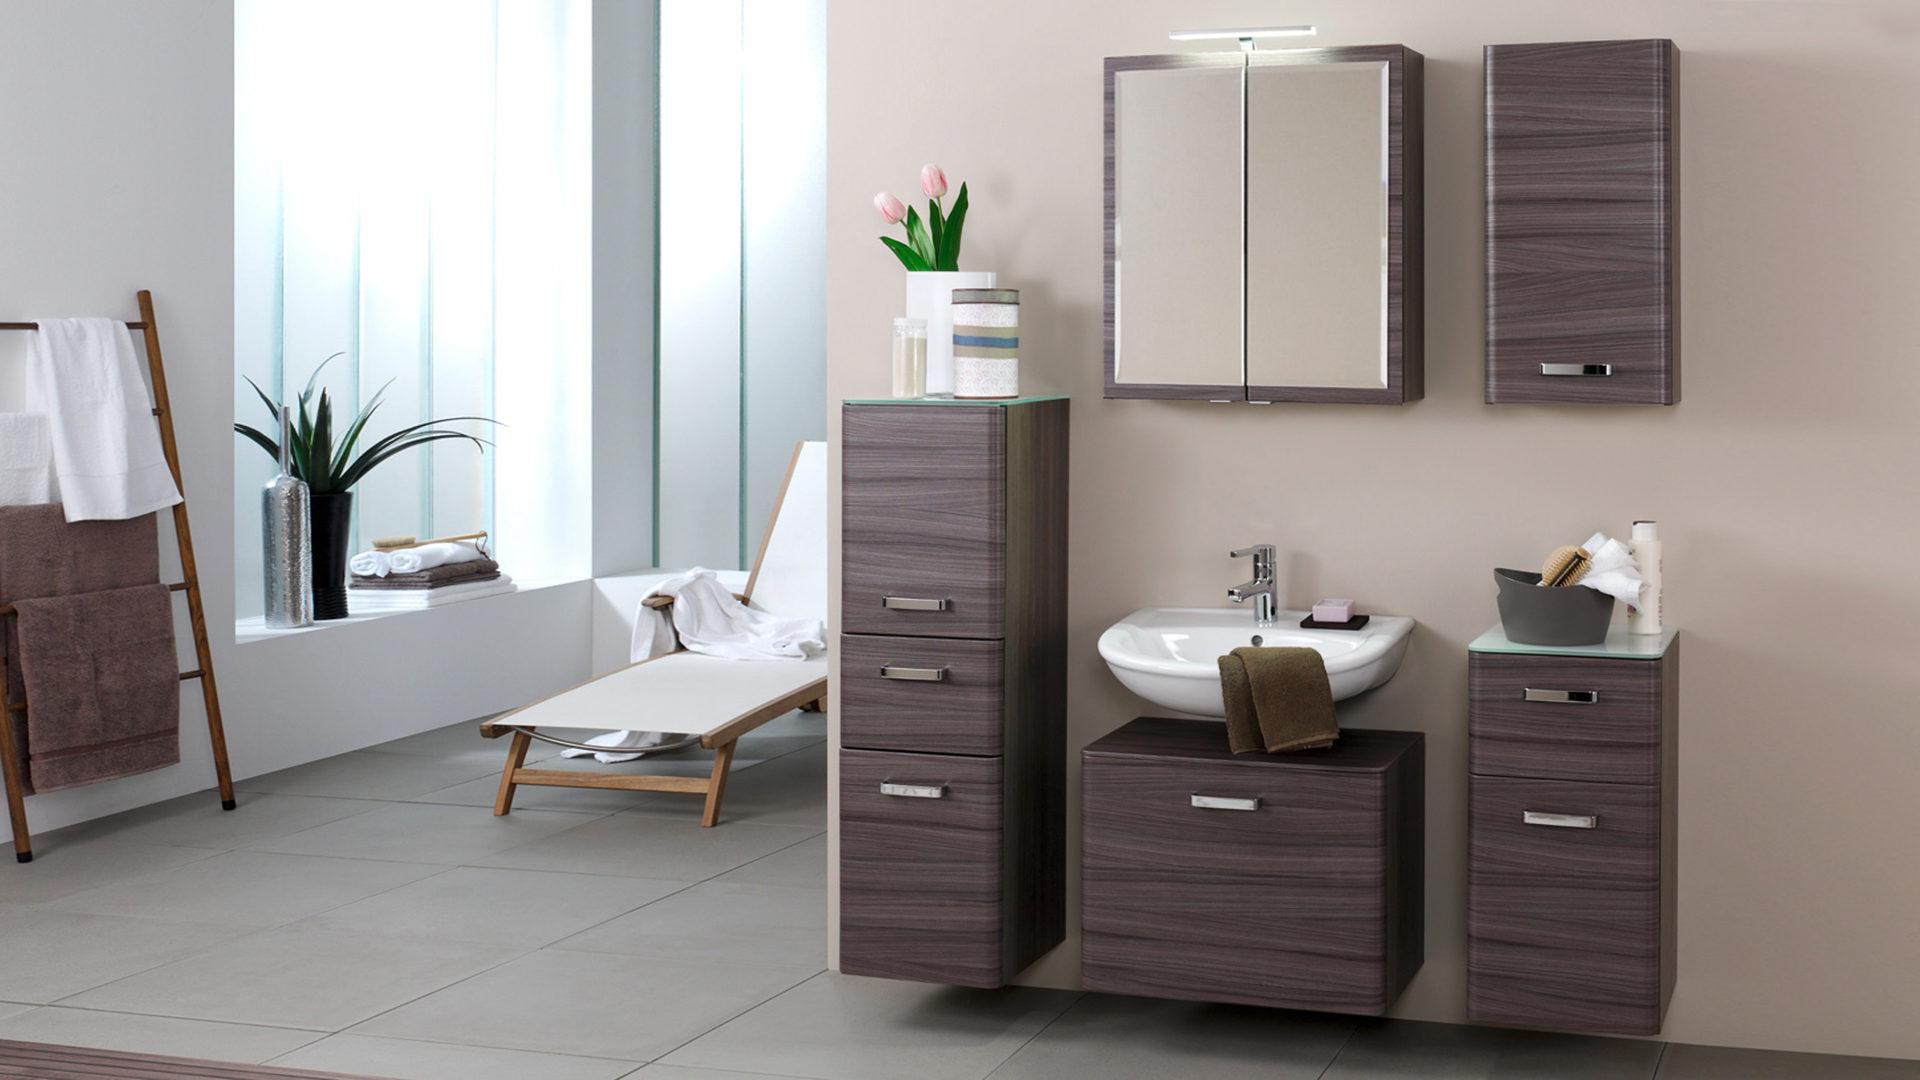 download badezimmer coesfeld | vitaplaza, Badezimmer ideen